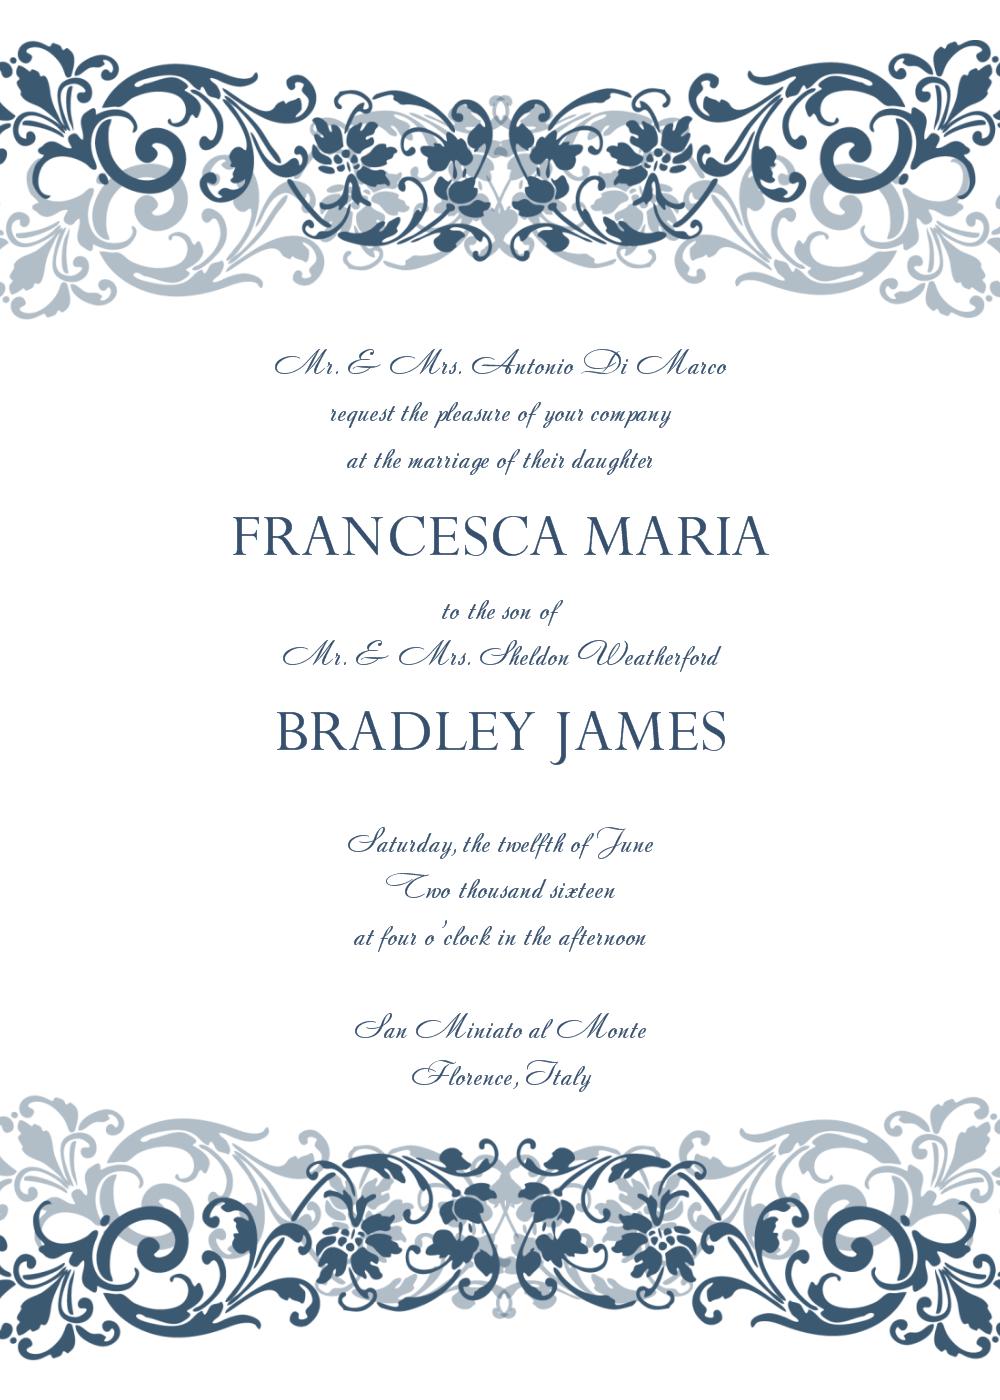 Free Wedding Invitation Templates For Word | Wedding Invitation - Free Printable Monogram Wedding Invitation Templates